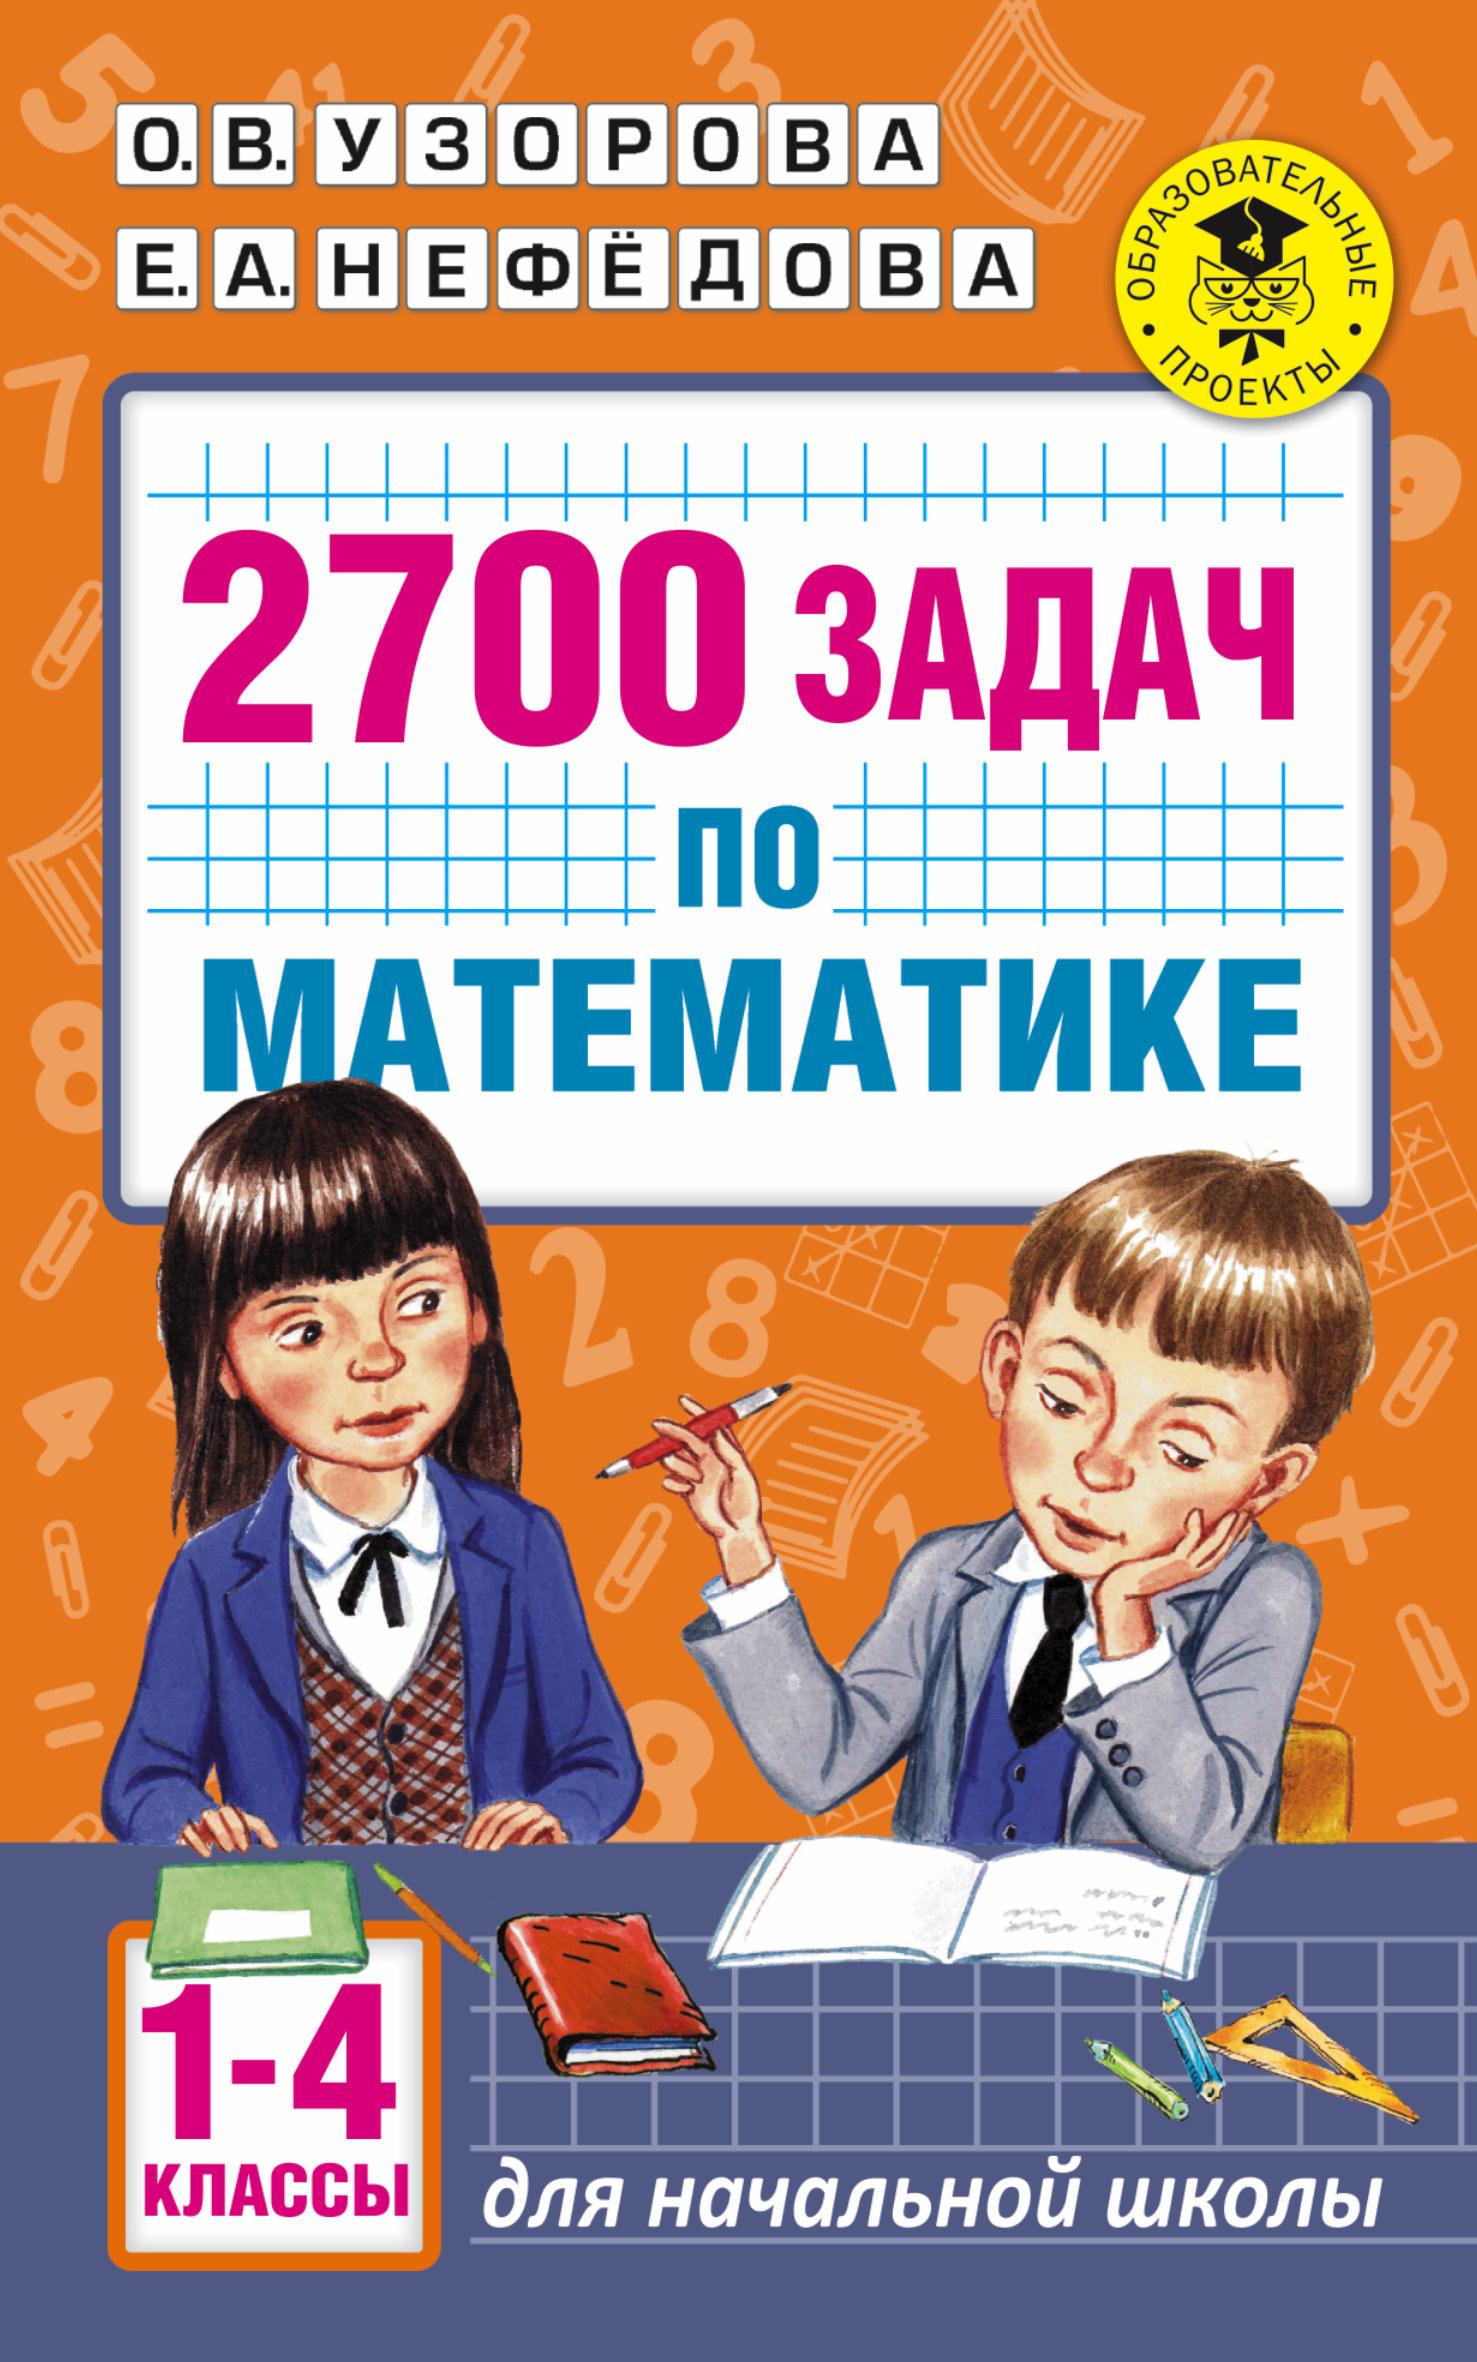 Узорова О.В. 2700 задач по математике. 1-4 класс. Познавательный задачник узорова ольга васильевна нефёдова елена алексеевна 2700 задач по математике 1 4 класс познавательный задачник